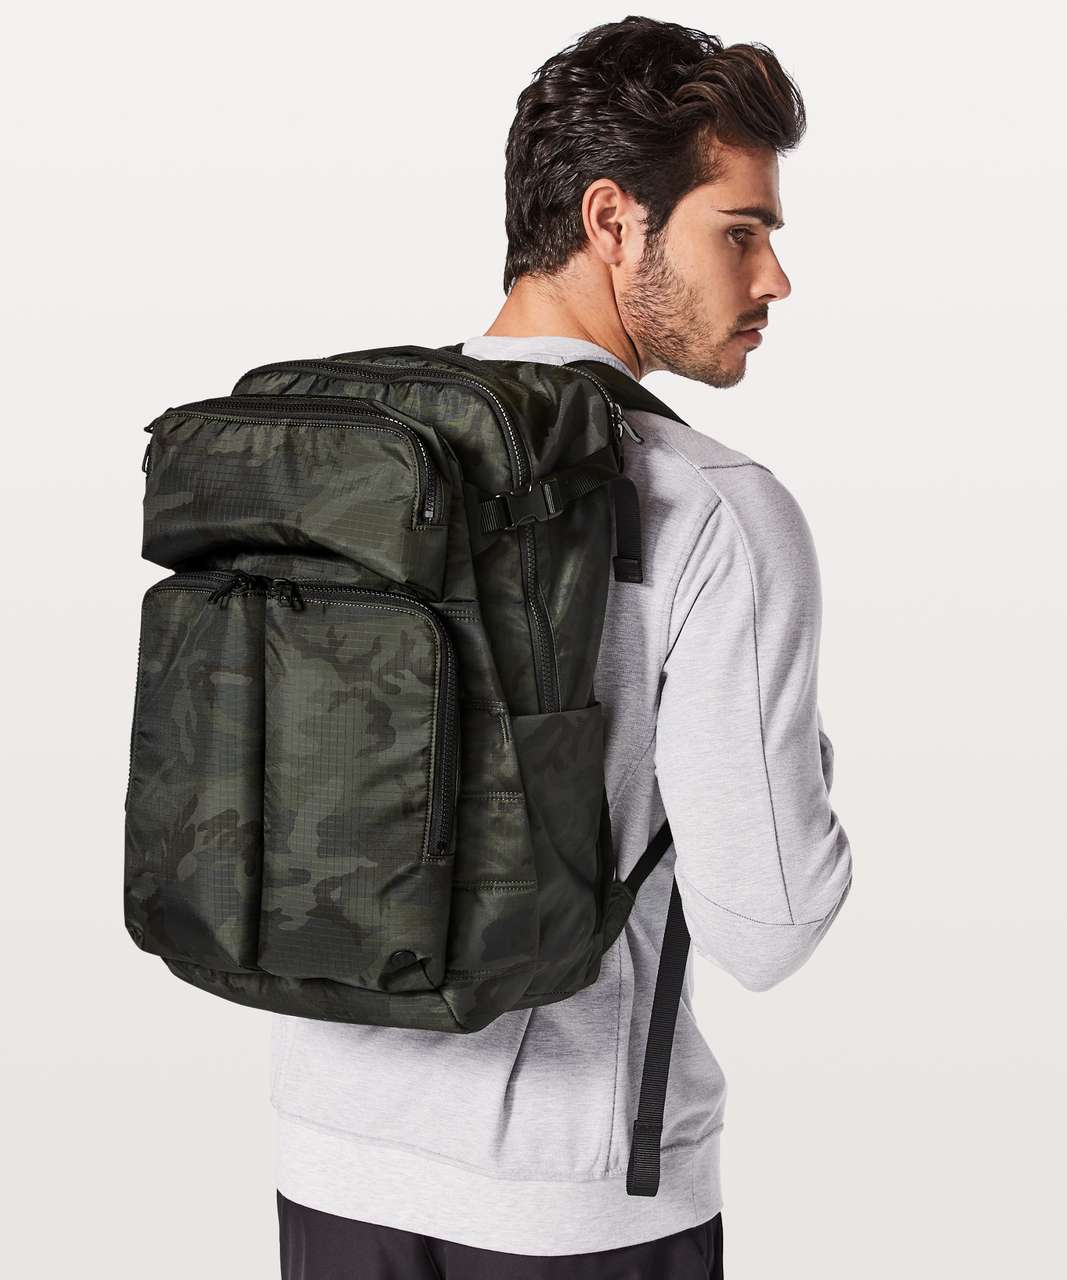 d489ce3a49 Lululemon Assert Backpack *30L - Woodland Camo Multi Green - lulu fanatics